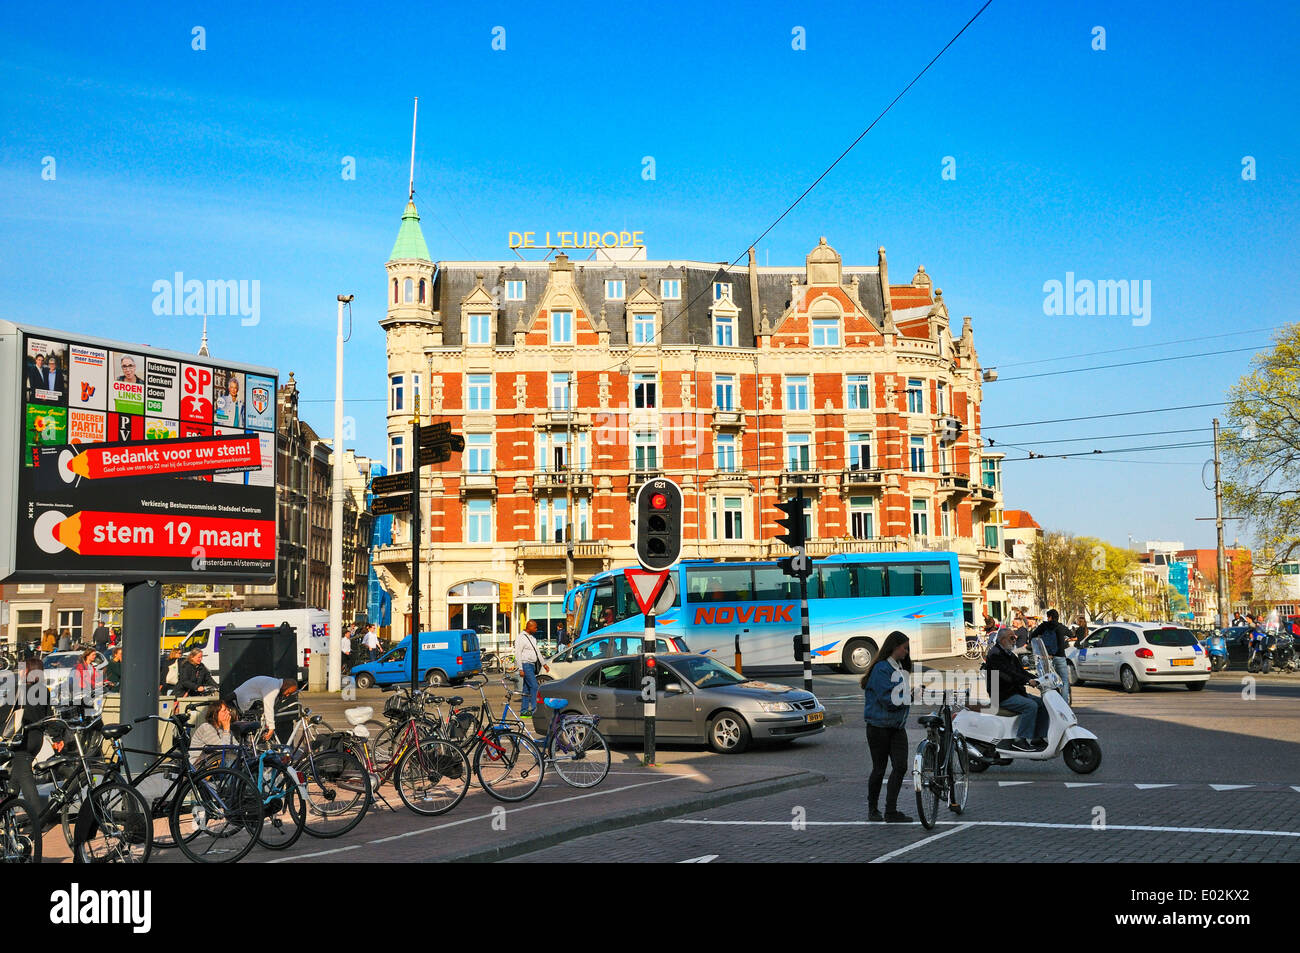 Hotel De L'Europe, Amsterdam, Netherlands - Stock Image